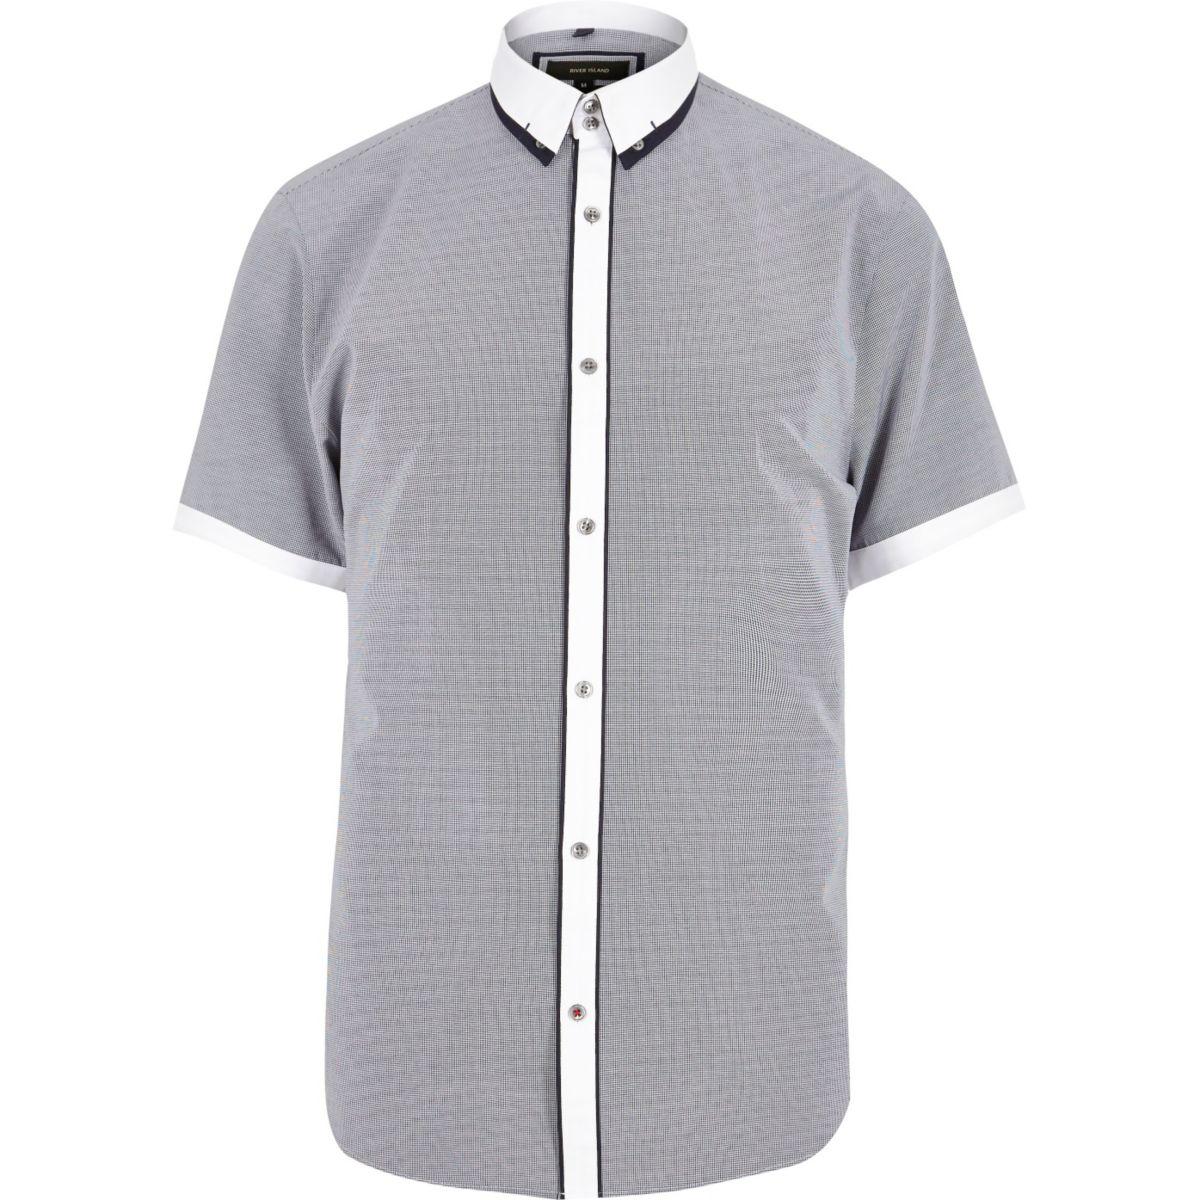 Navy Contrast Slim Fit Shirt Shirts Sale Men